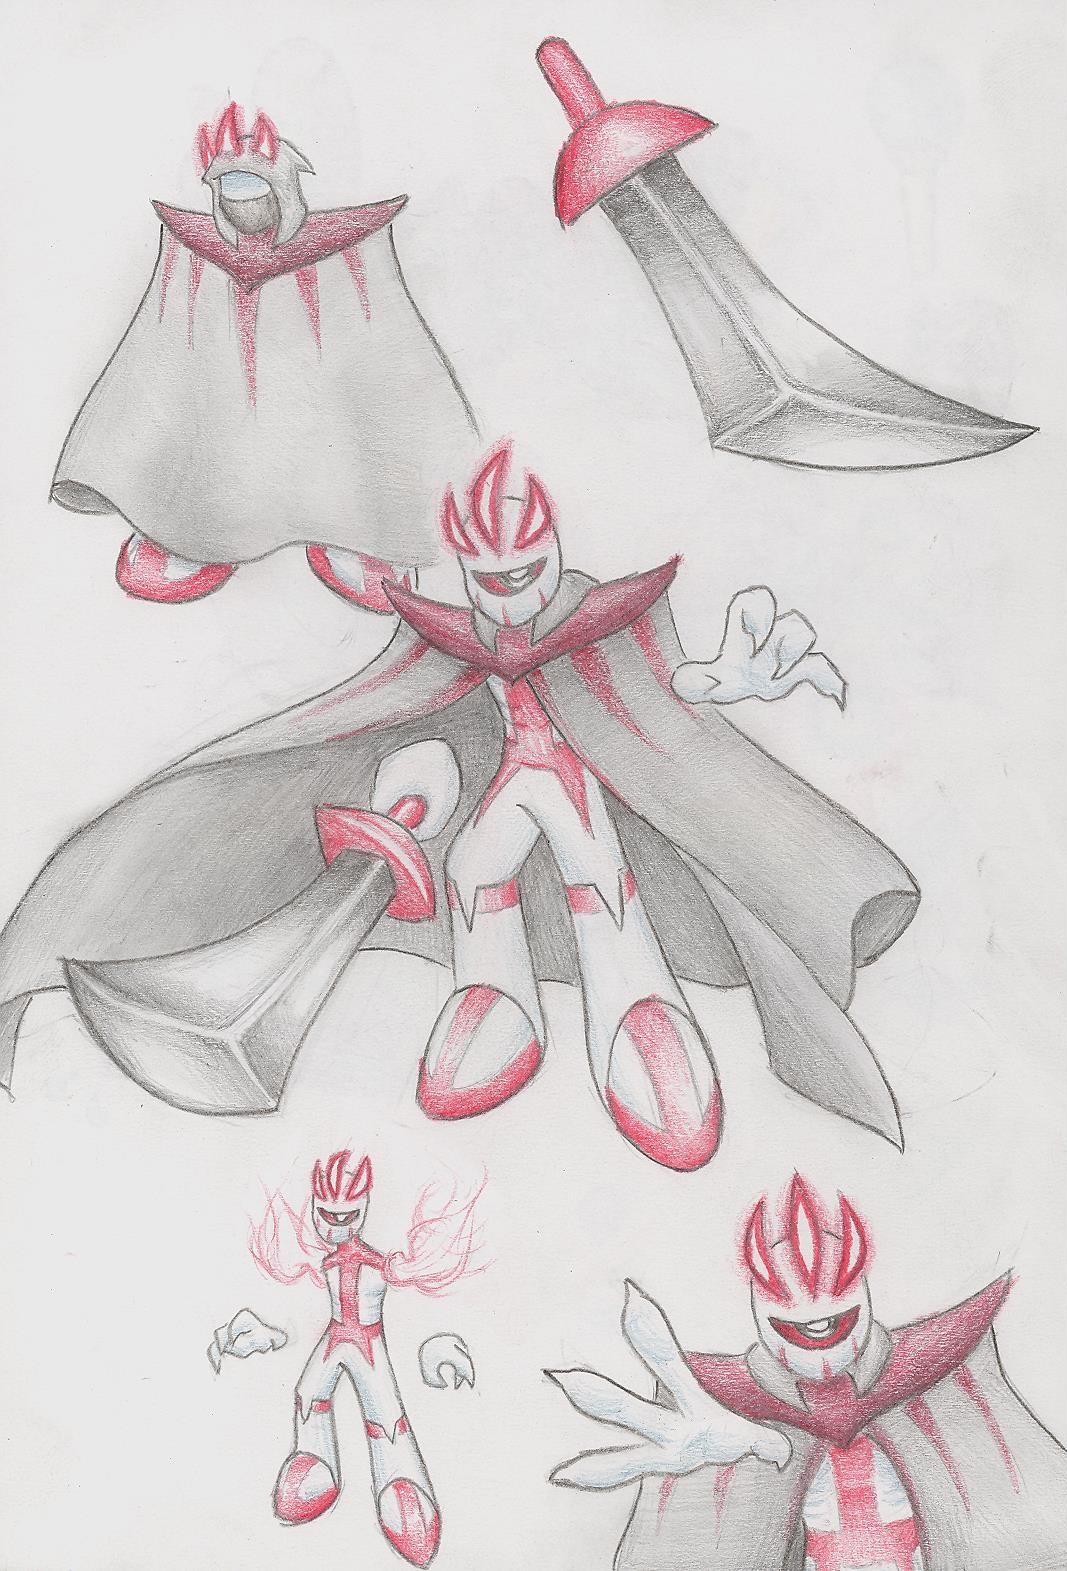 Dark Lord Zero version 2 by ssbbforeva